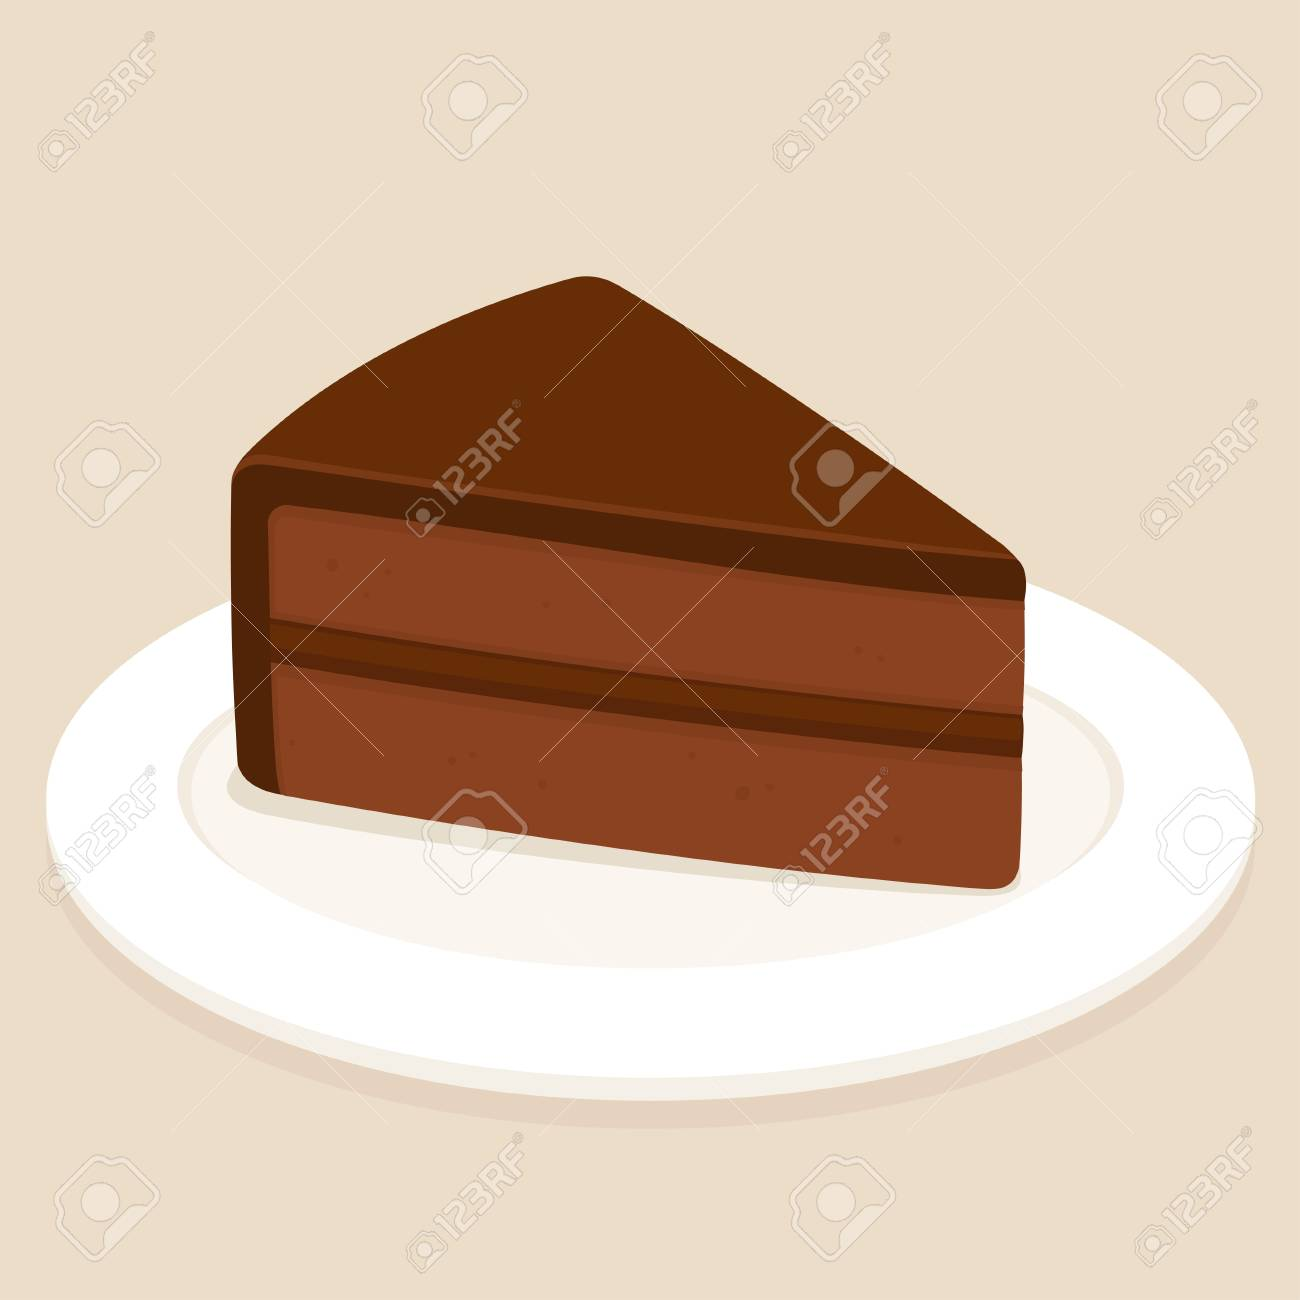 Sachertorte, traditional Austrian chocolate cake with ganache frosting vector illustration - 101154462